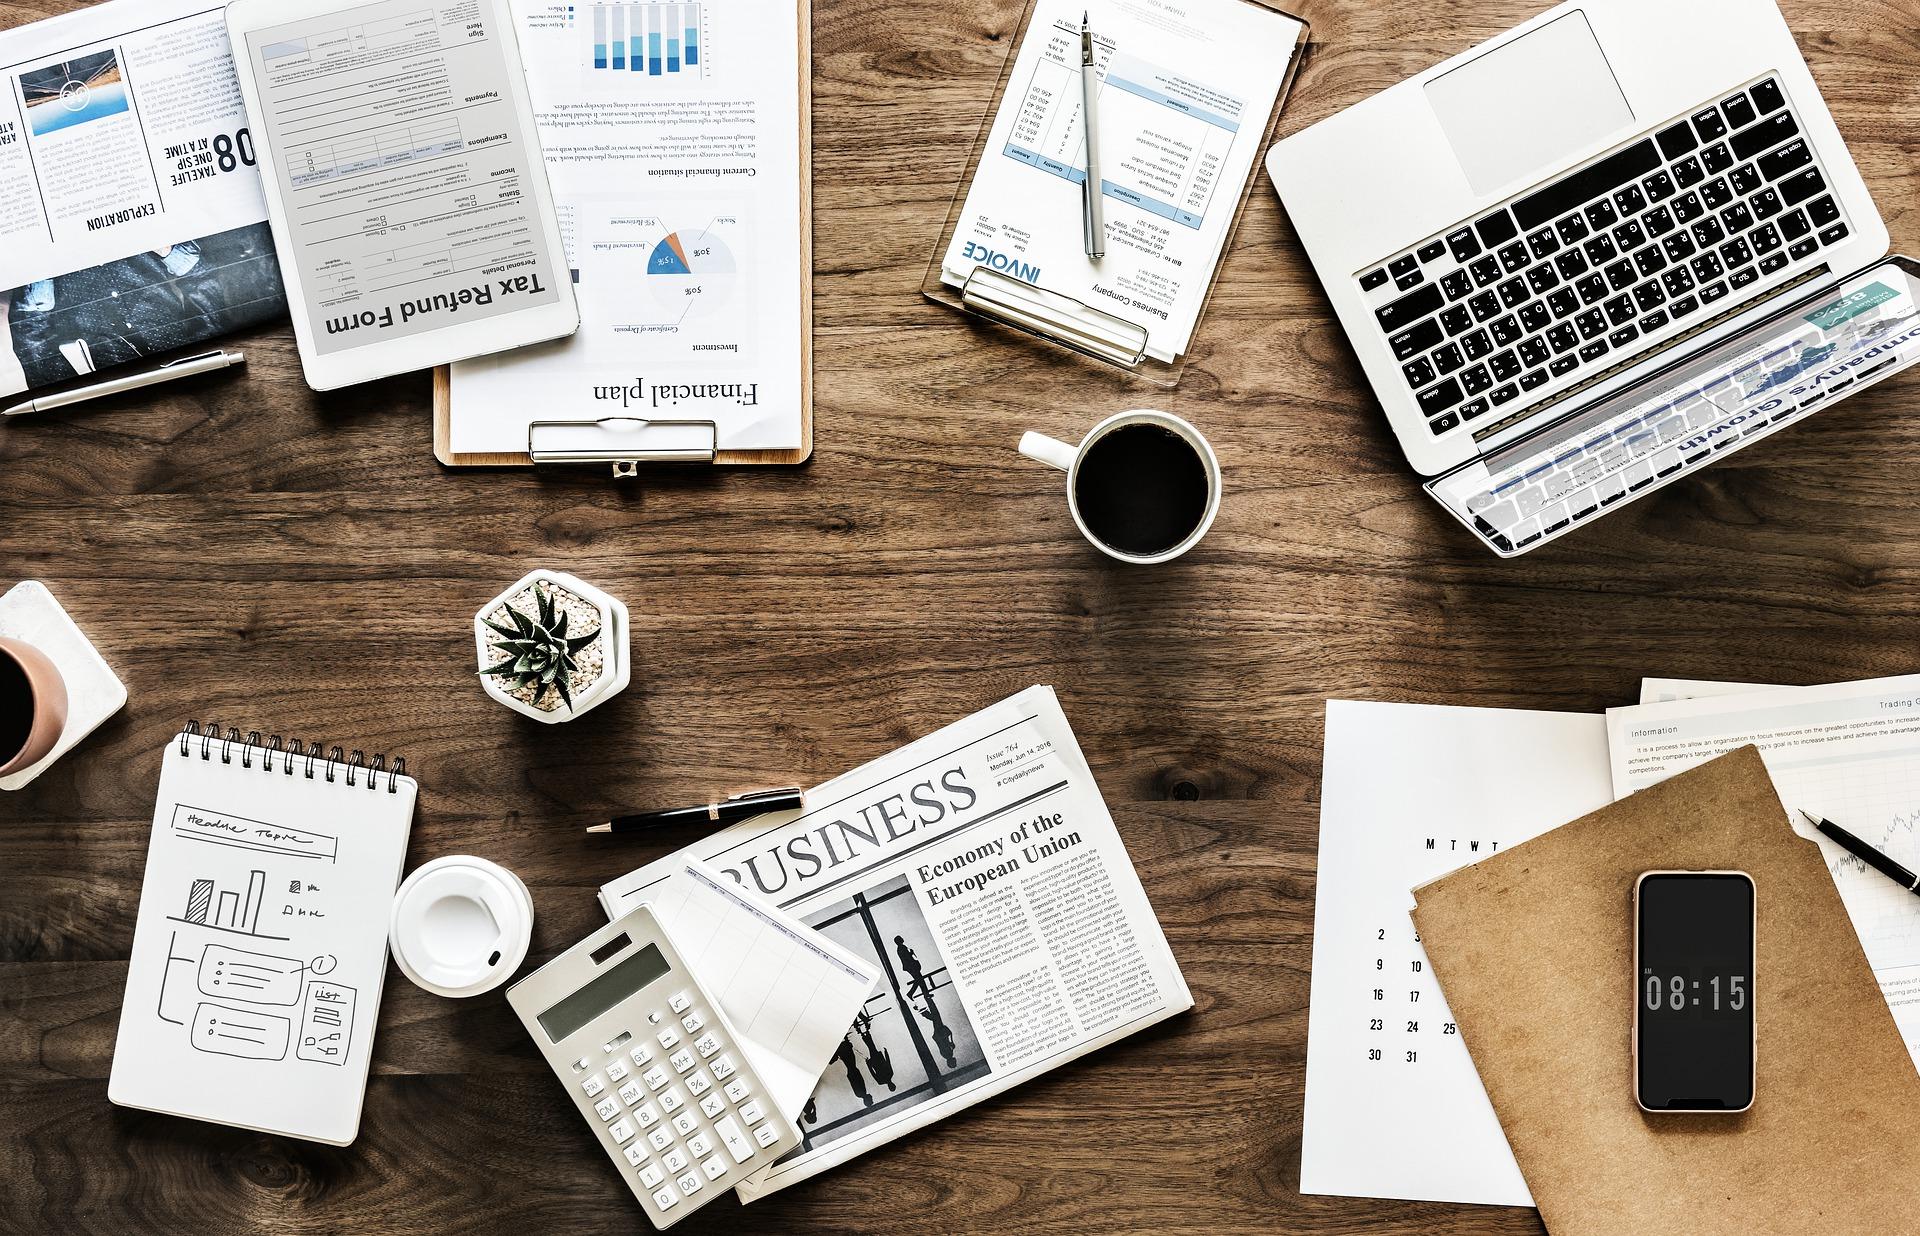 business desk laptop newspaper finance